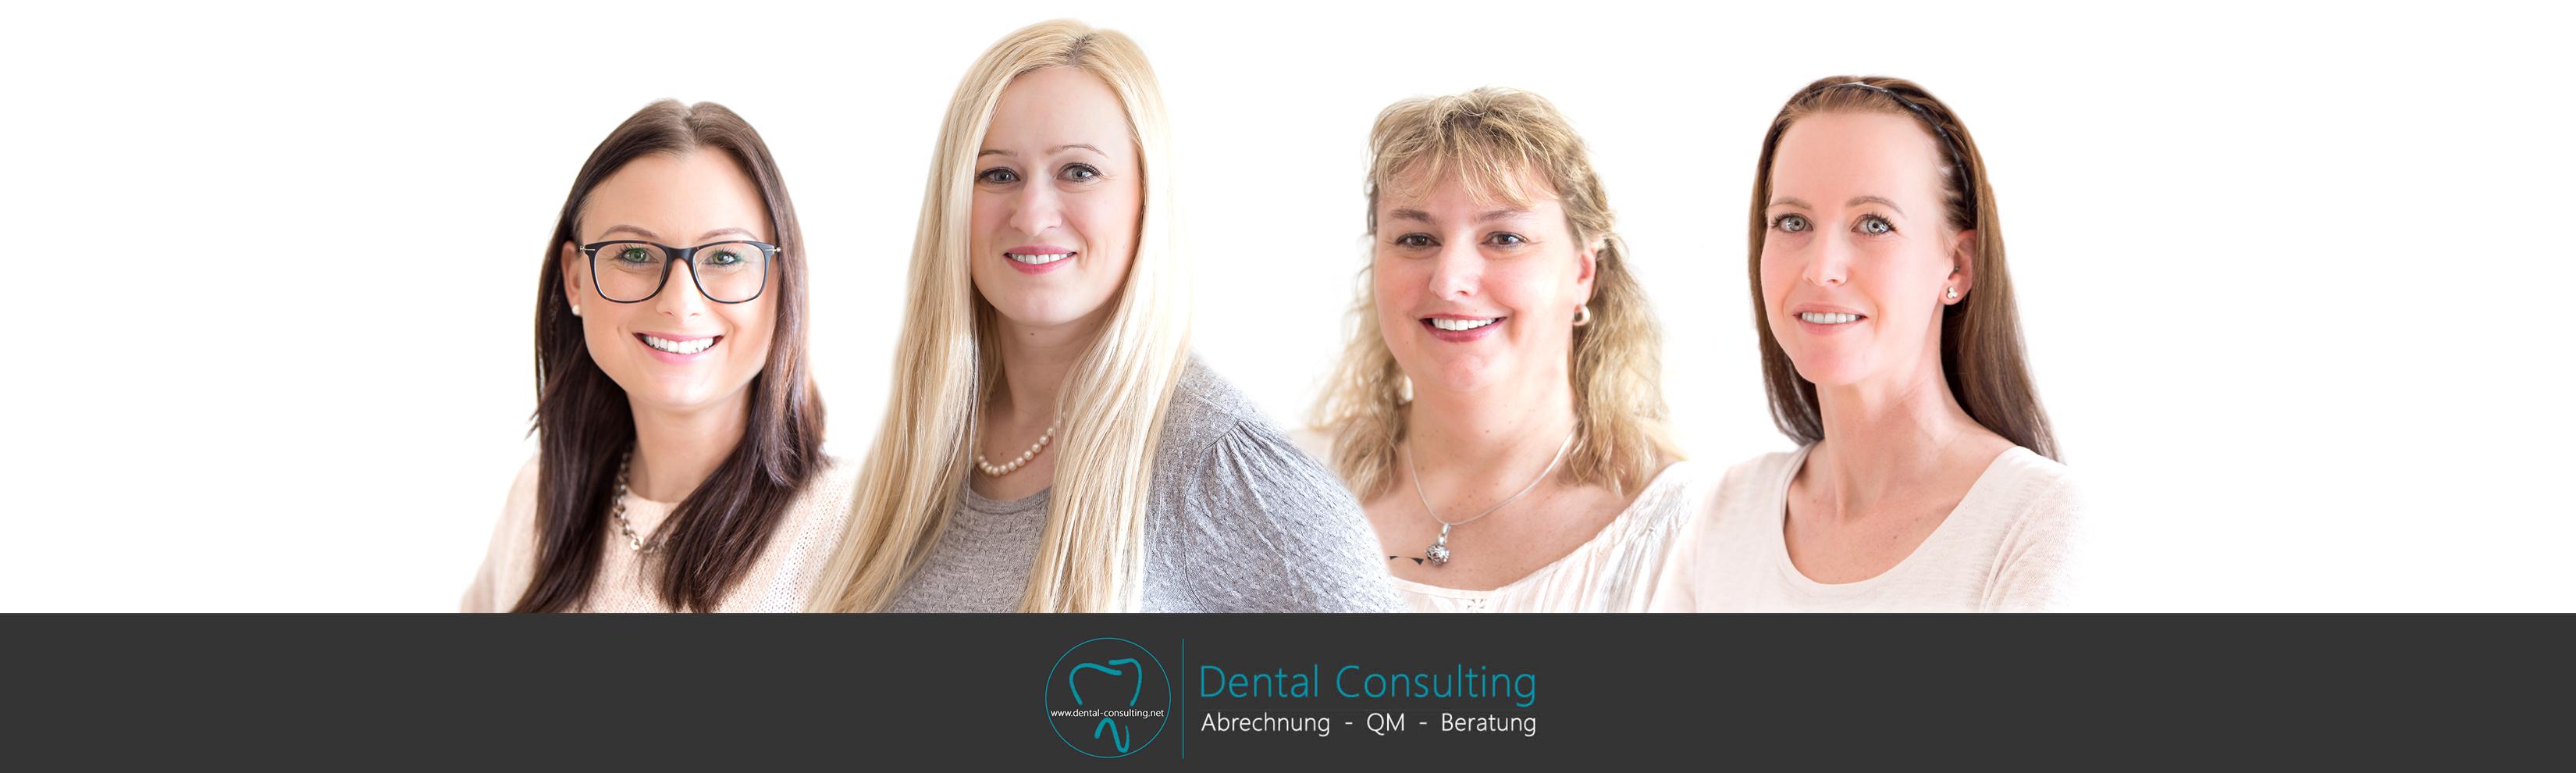 Dental Consulting Mitarbeiter